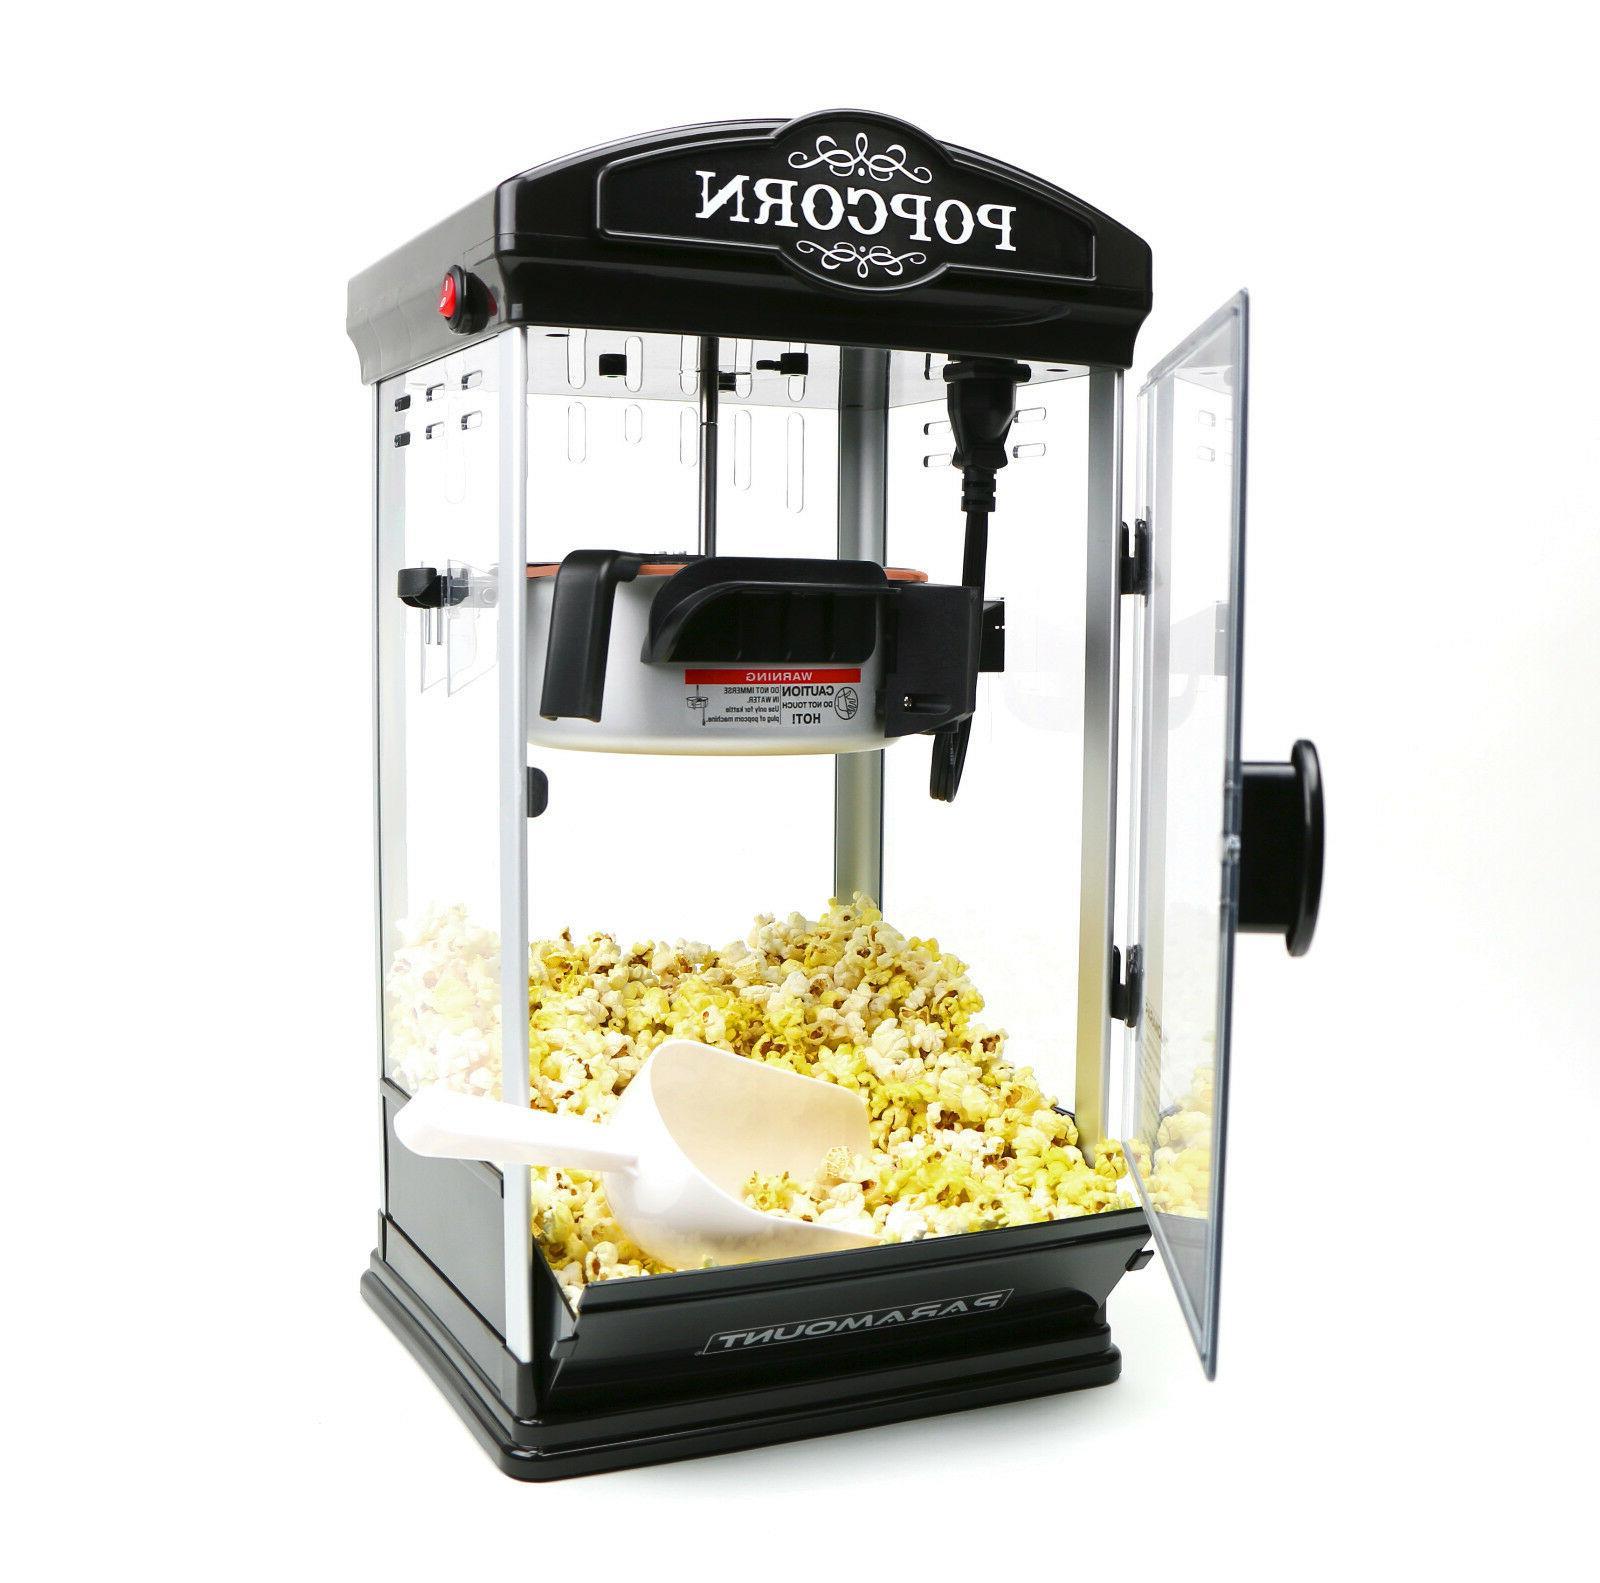 8oz black popcorn maker machine by new